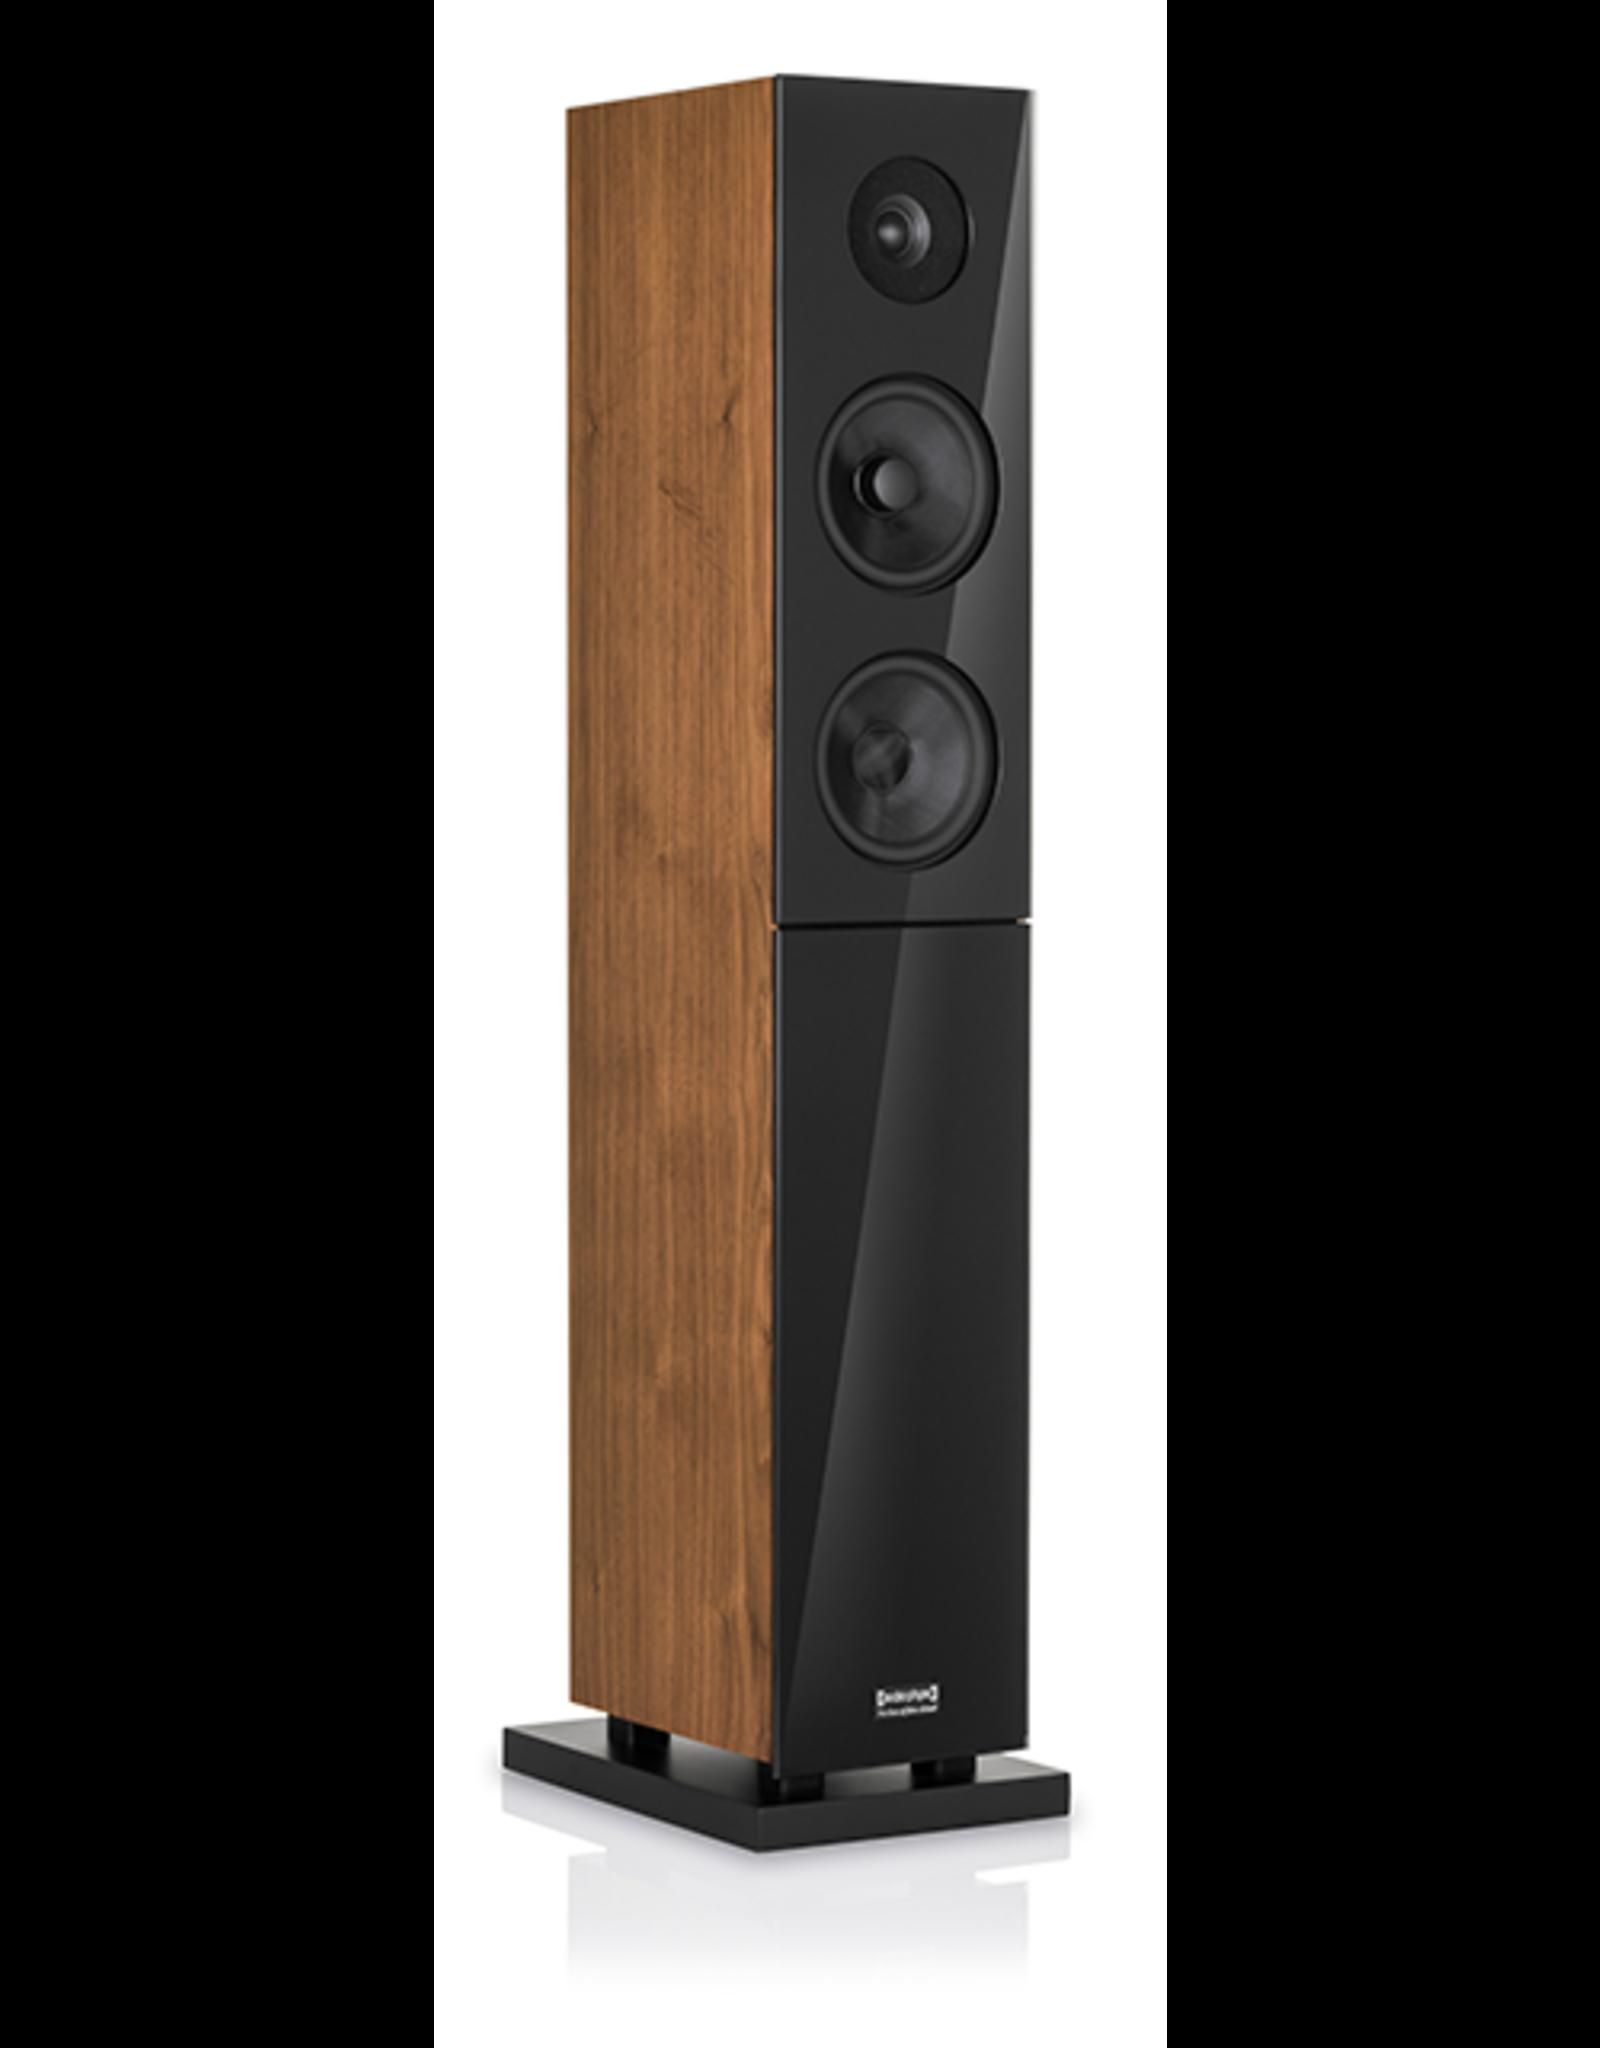 Audio Physic Audio Physic Classic 12 Floorstanding Speakers Walnut EX-DEMO